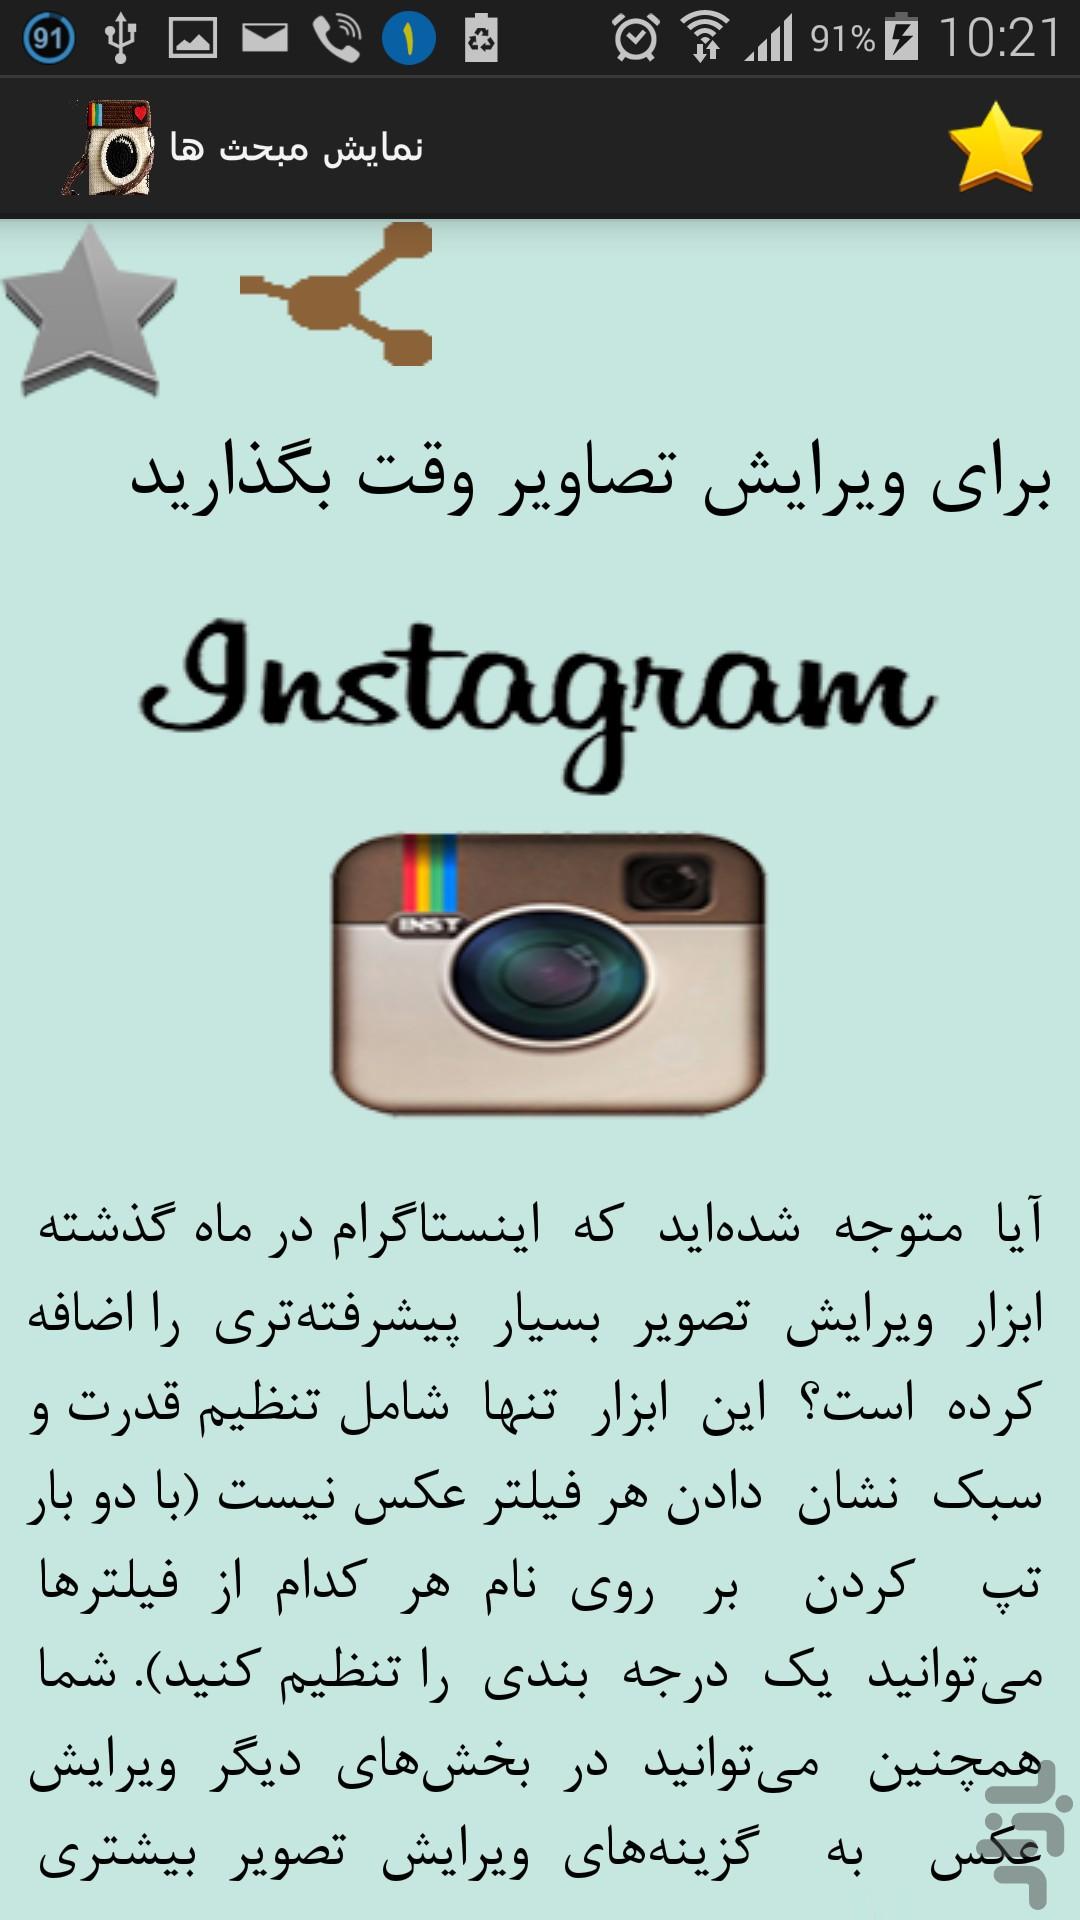 http://rozup.ir/up/shad-music/ANDROID/mohit/ir.insta_tarfand1.jpg